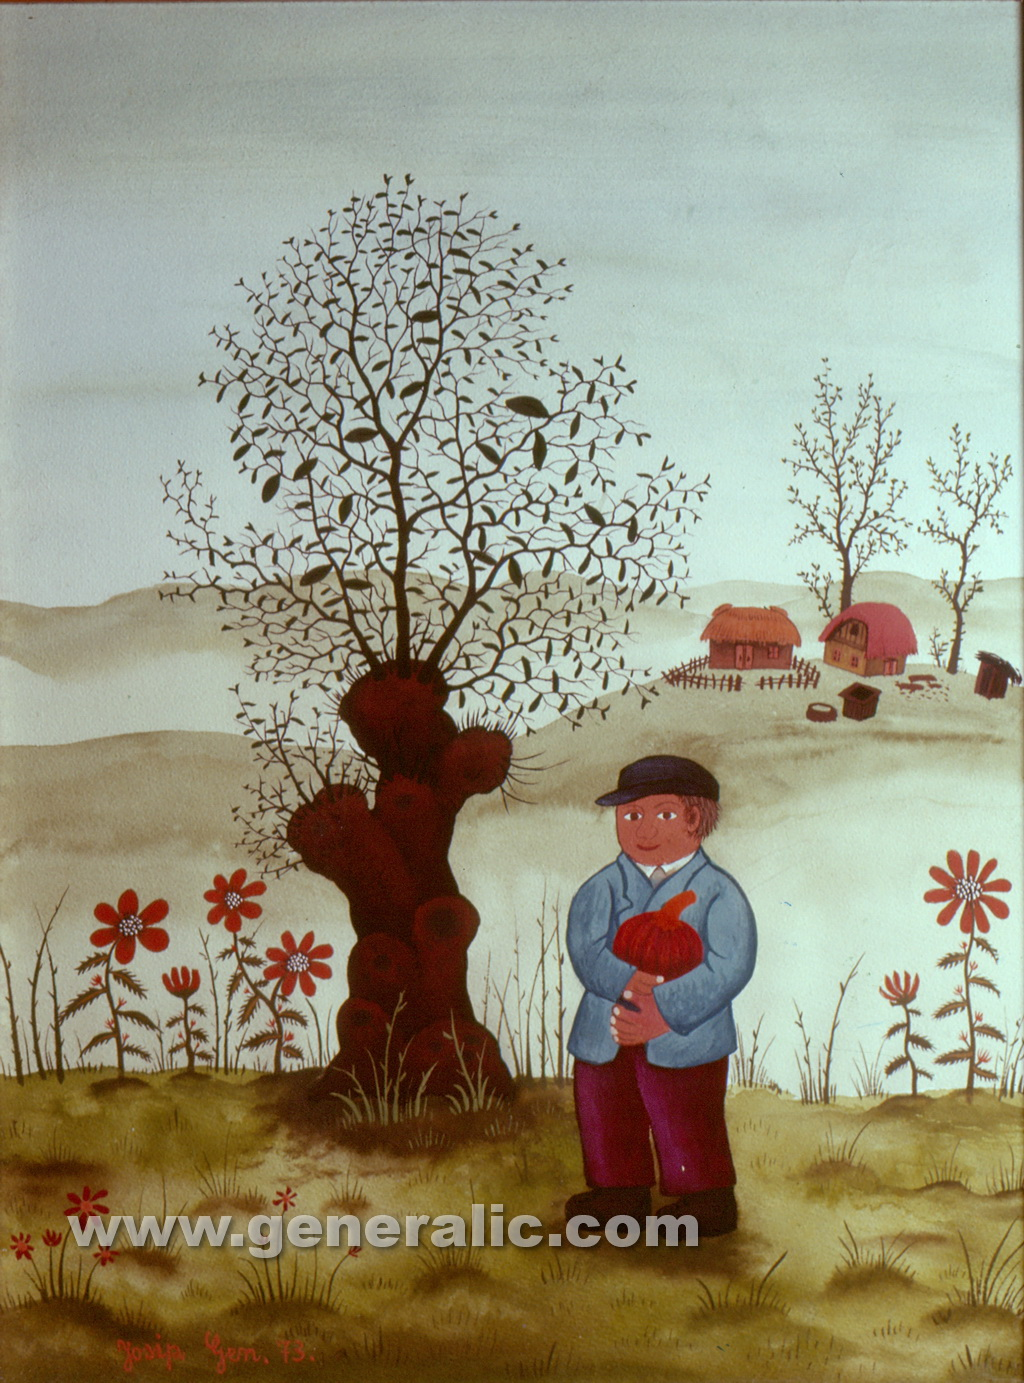 Josip Generalic, 1973, Boy with a pumpkin, watercolour